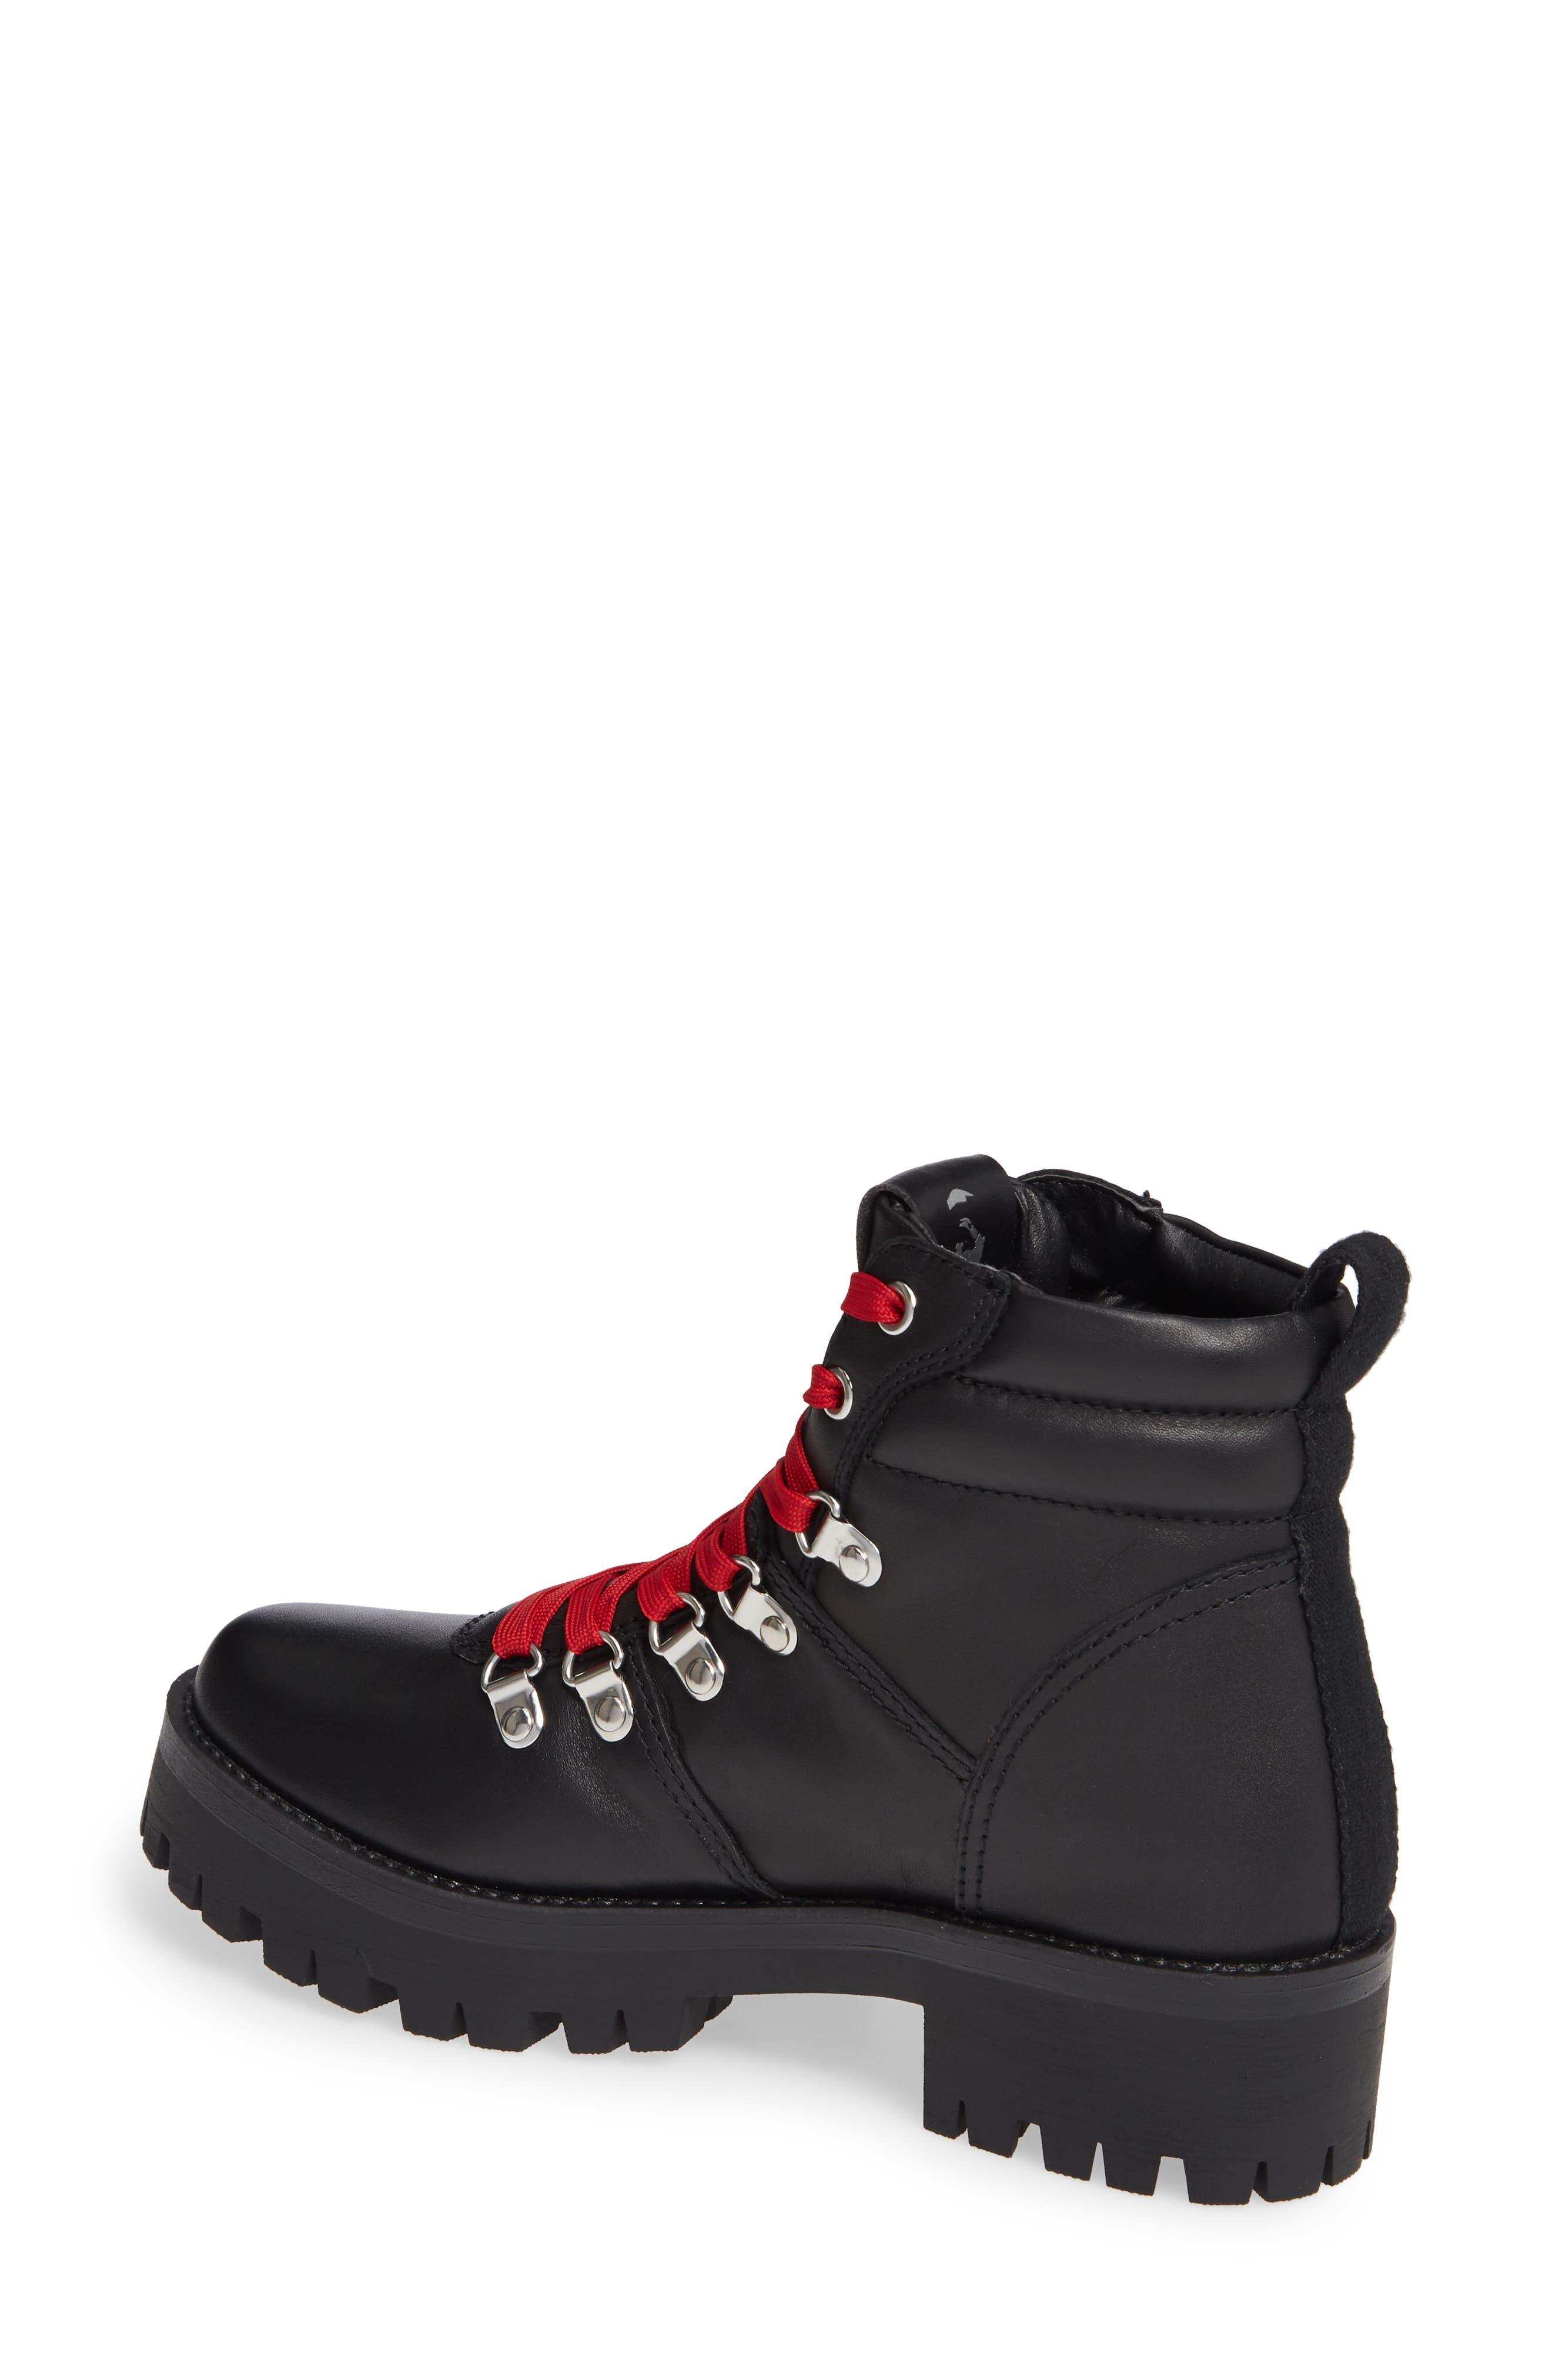 Buzzer Boot,                             Alternate thumbnail 2, color,                             BLACK LEATHER